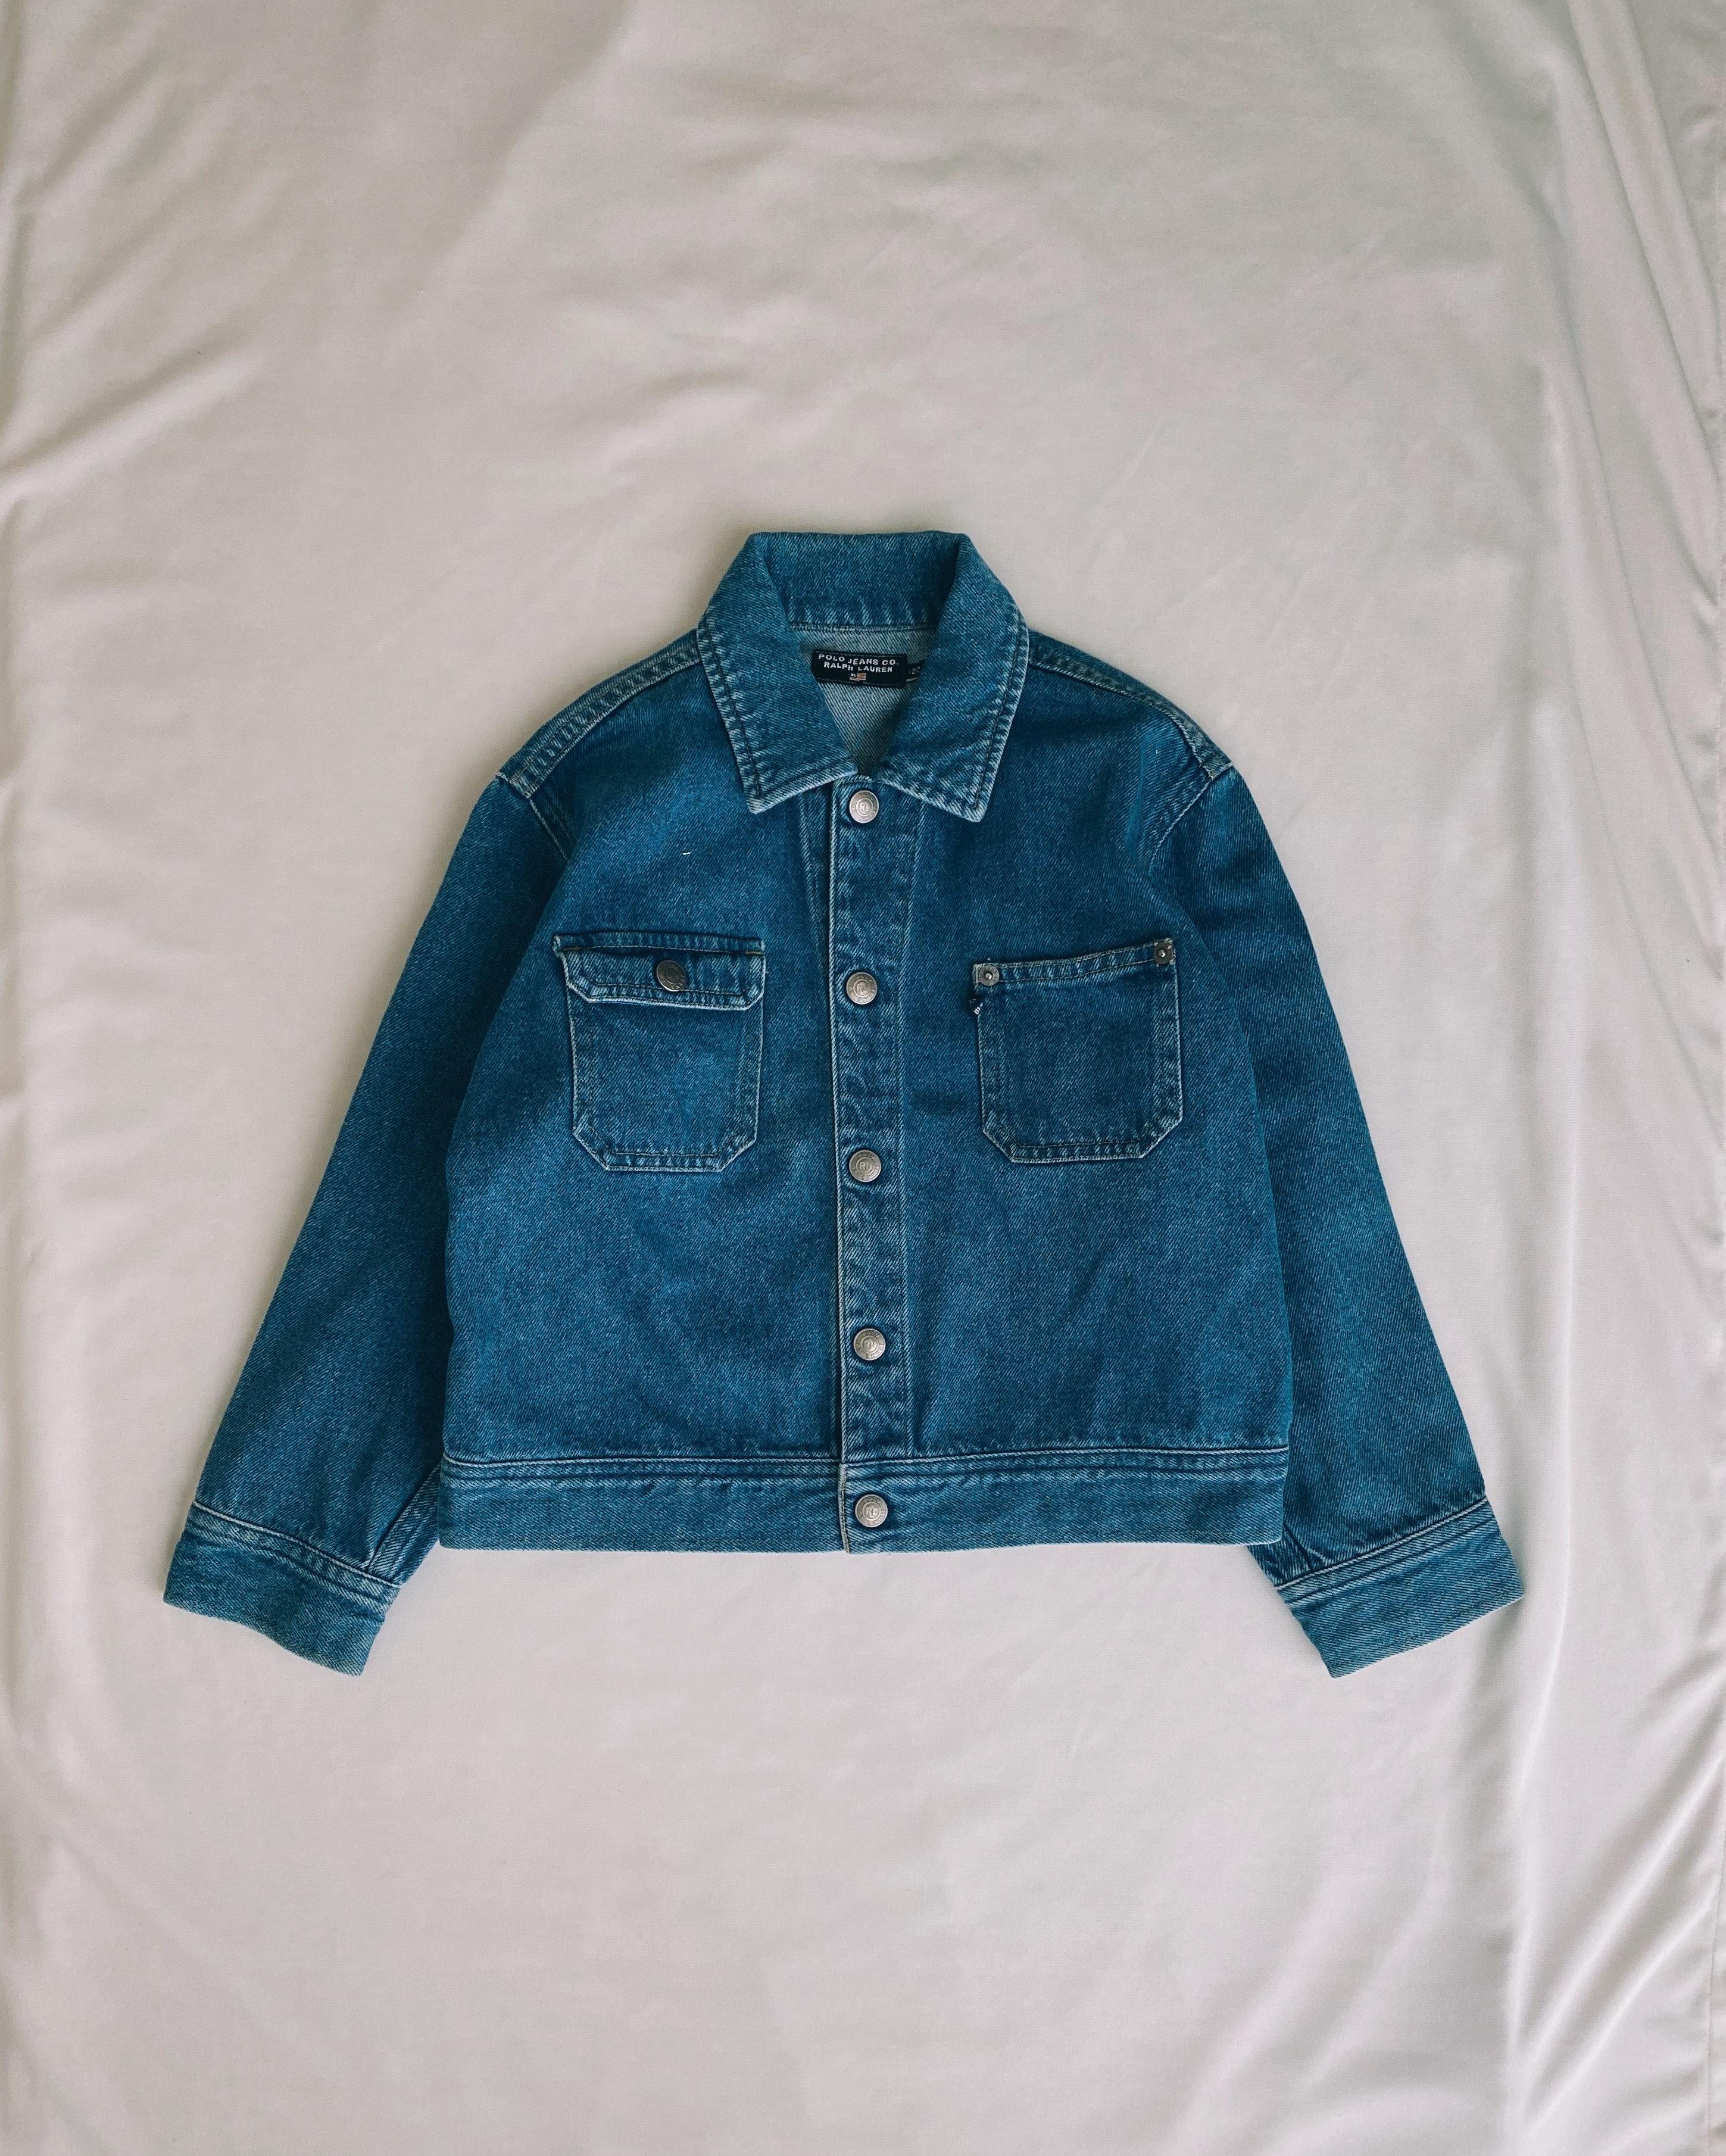 (KD190)120cm POLO JEANS denim jacket